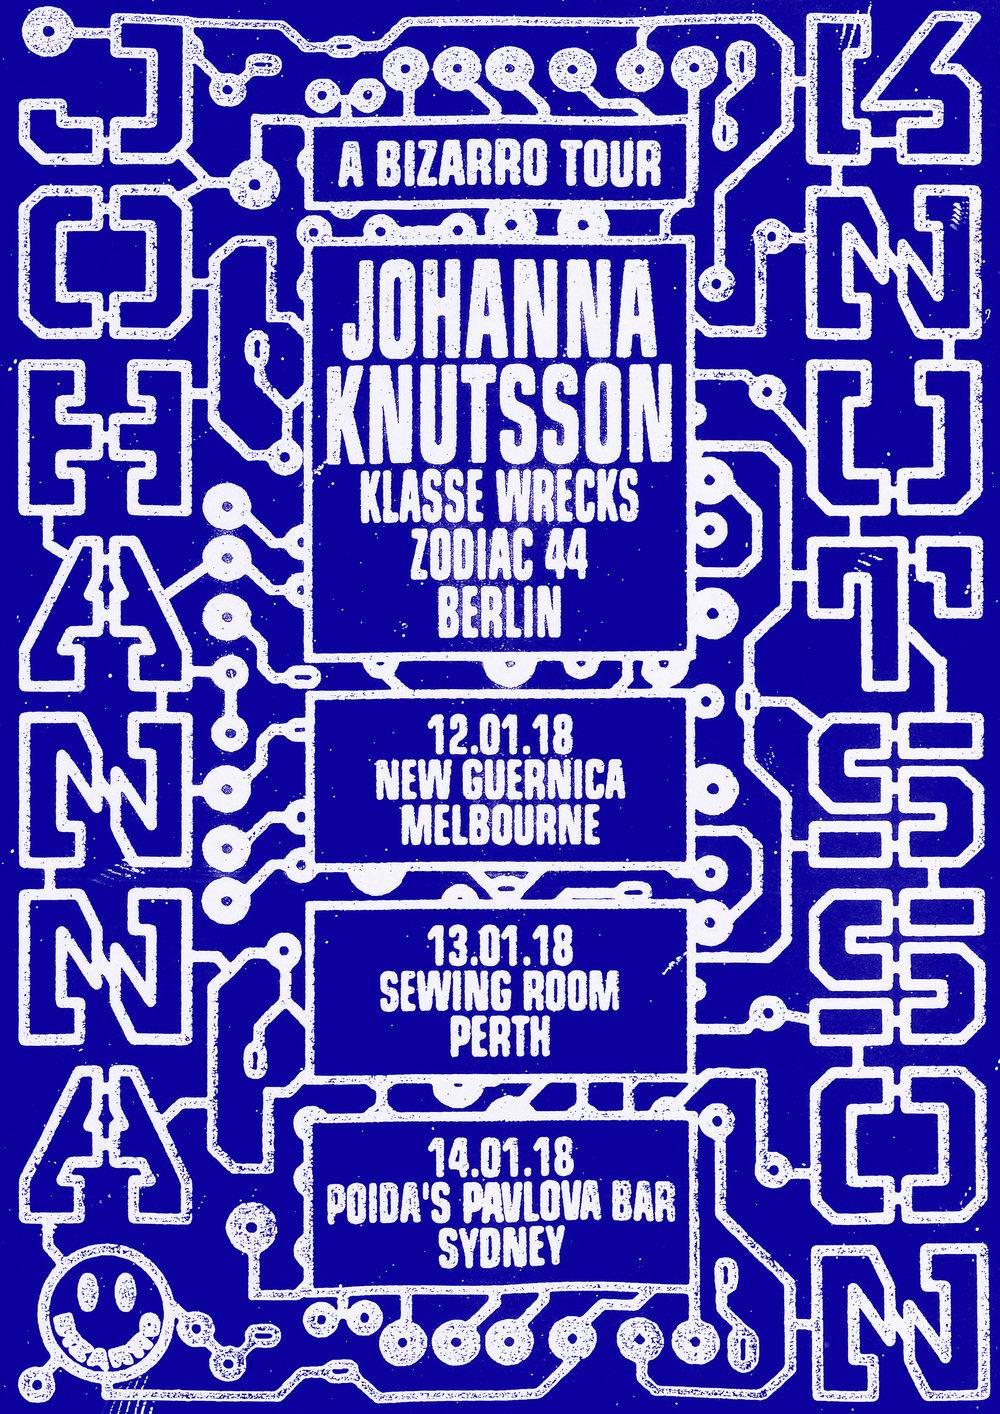 Johanna-Knutsson-Aus-Tour-Flyer-Scan.jpg